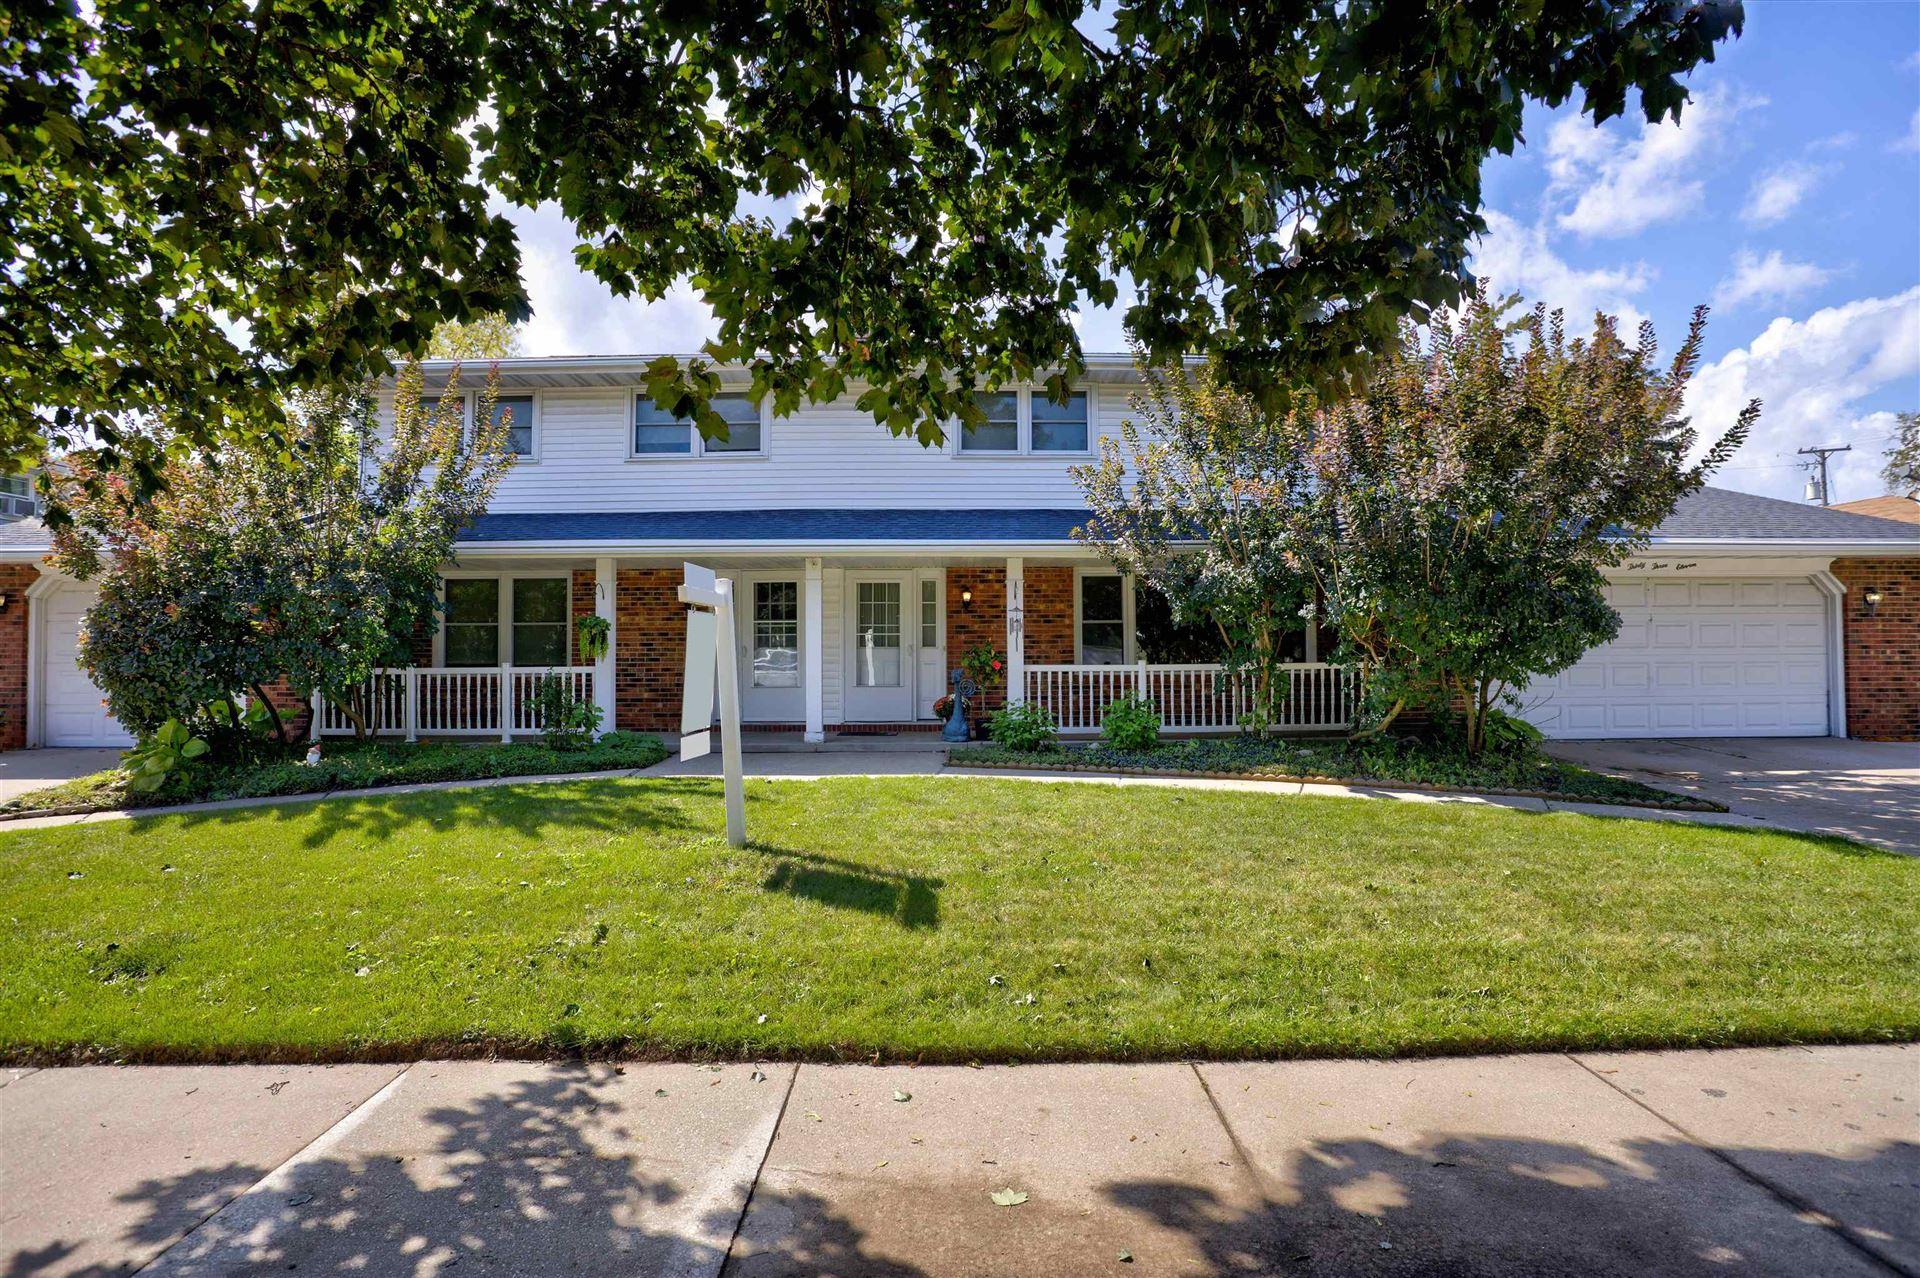 3309 N RANKIN Street, Appleton, WI 54911 - MLS#: 50247305